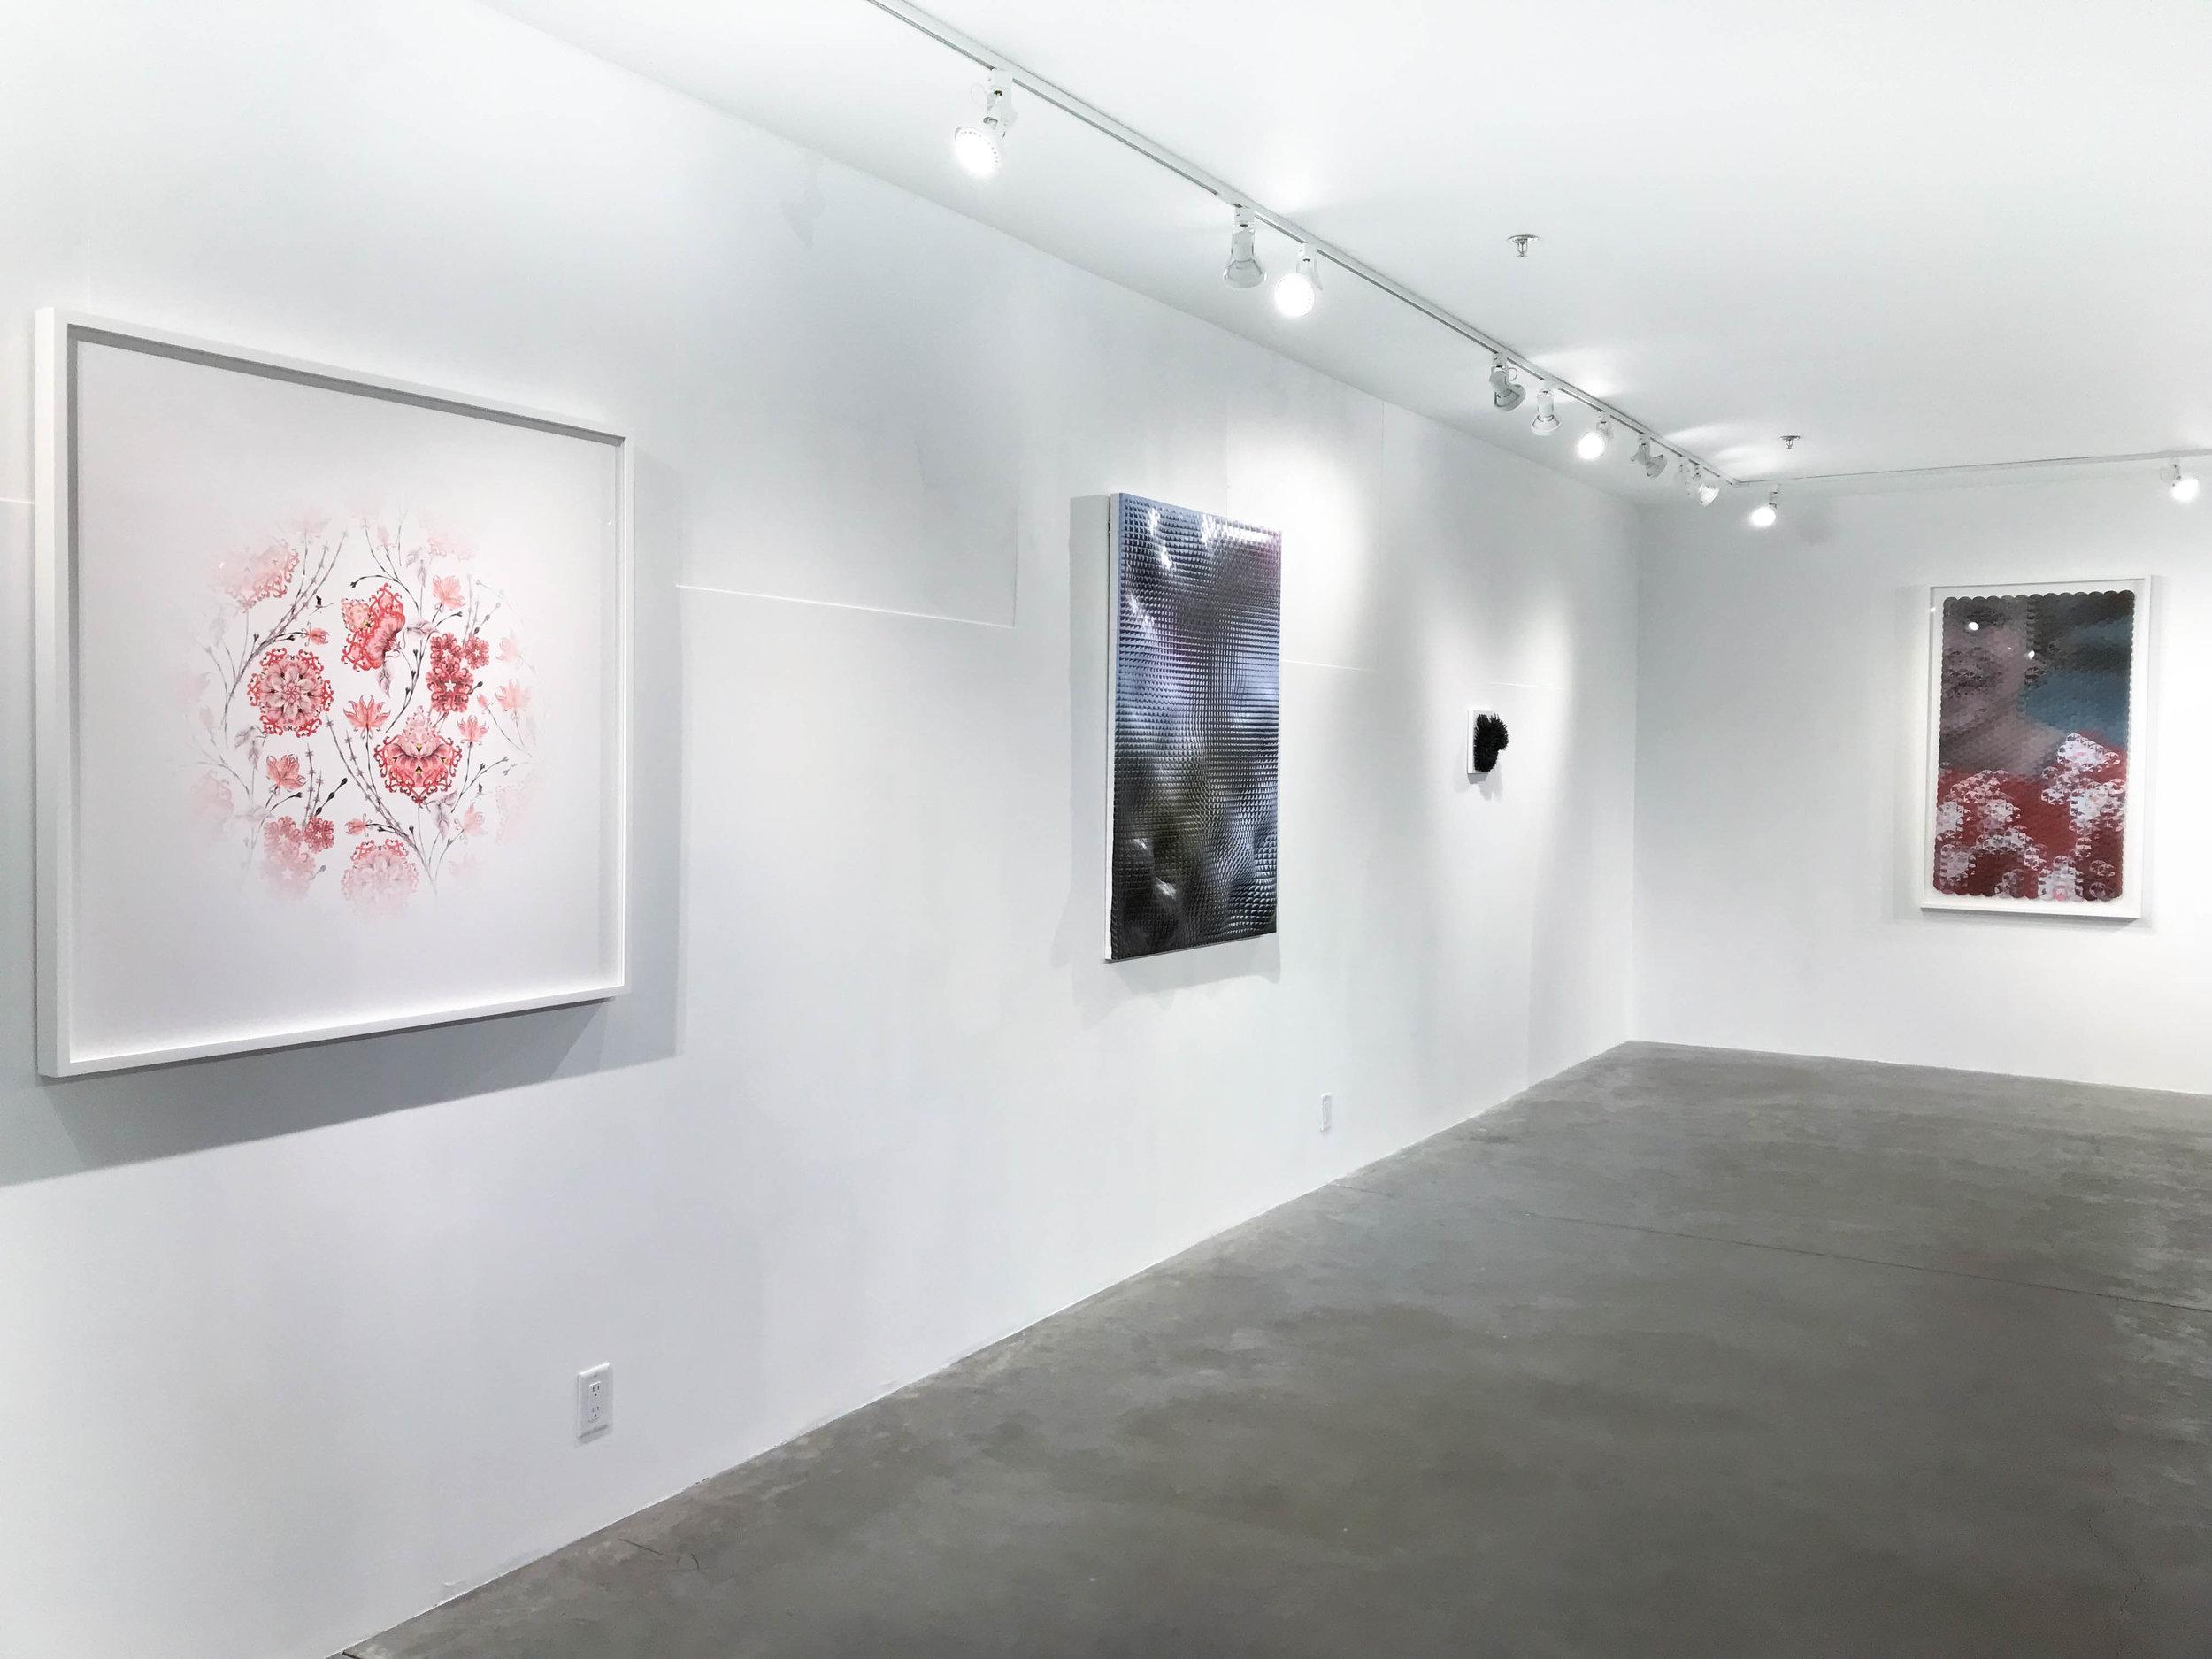 Installation View: The Awakening, November 2017